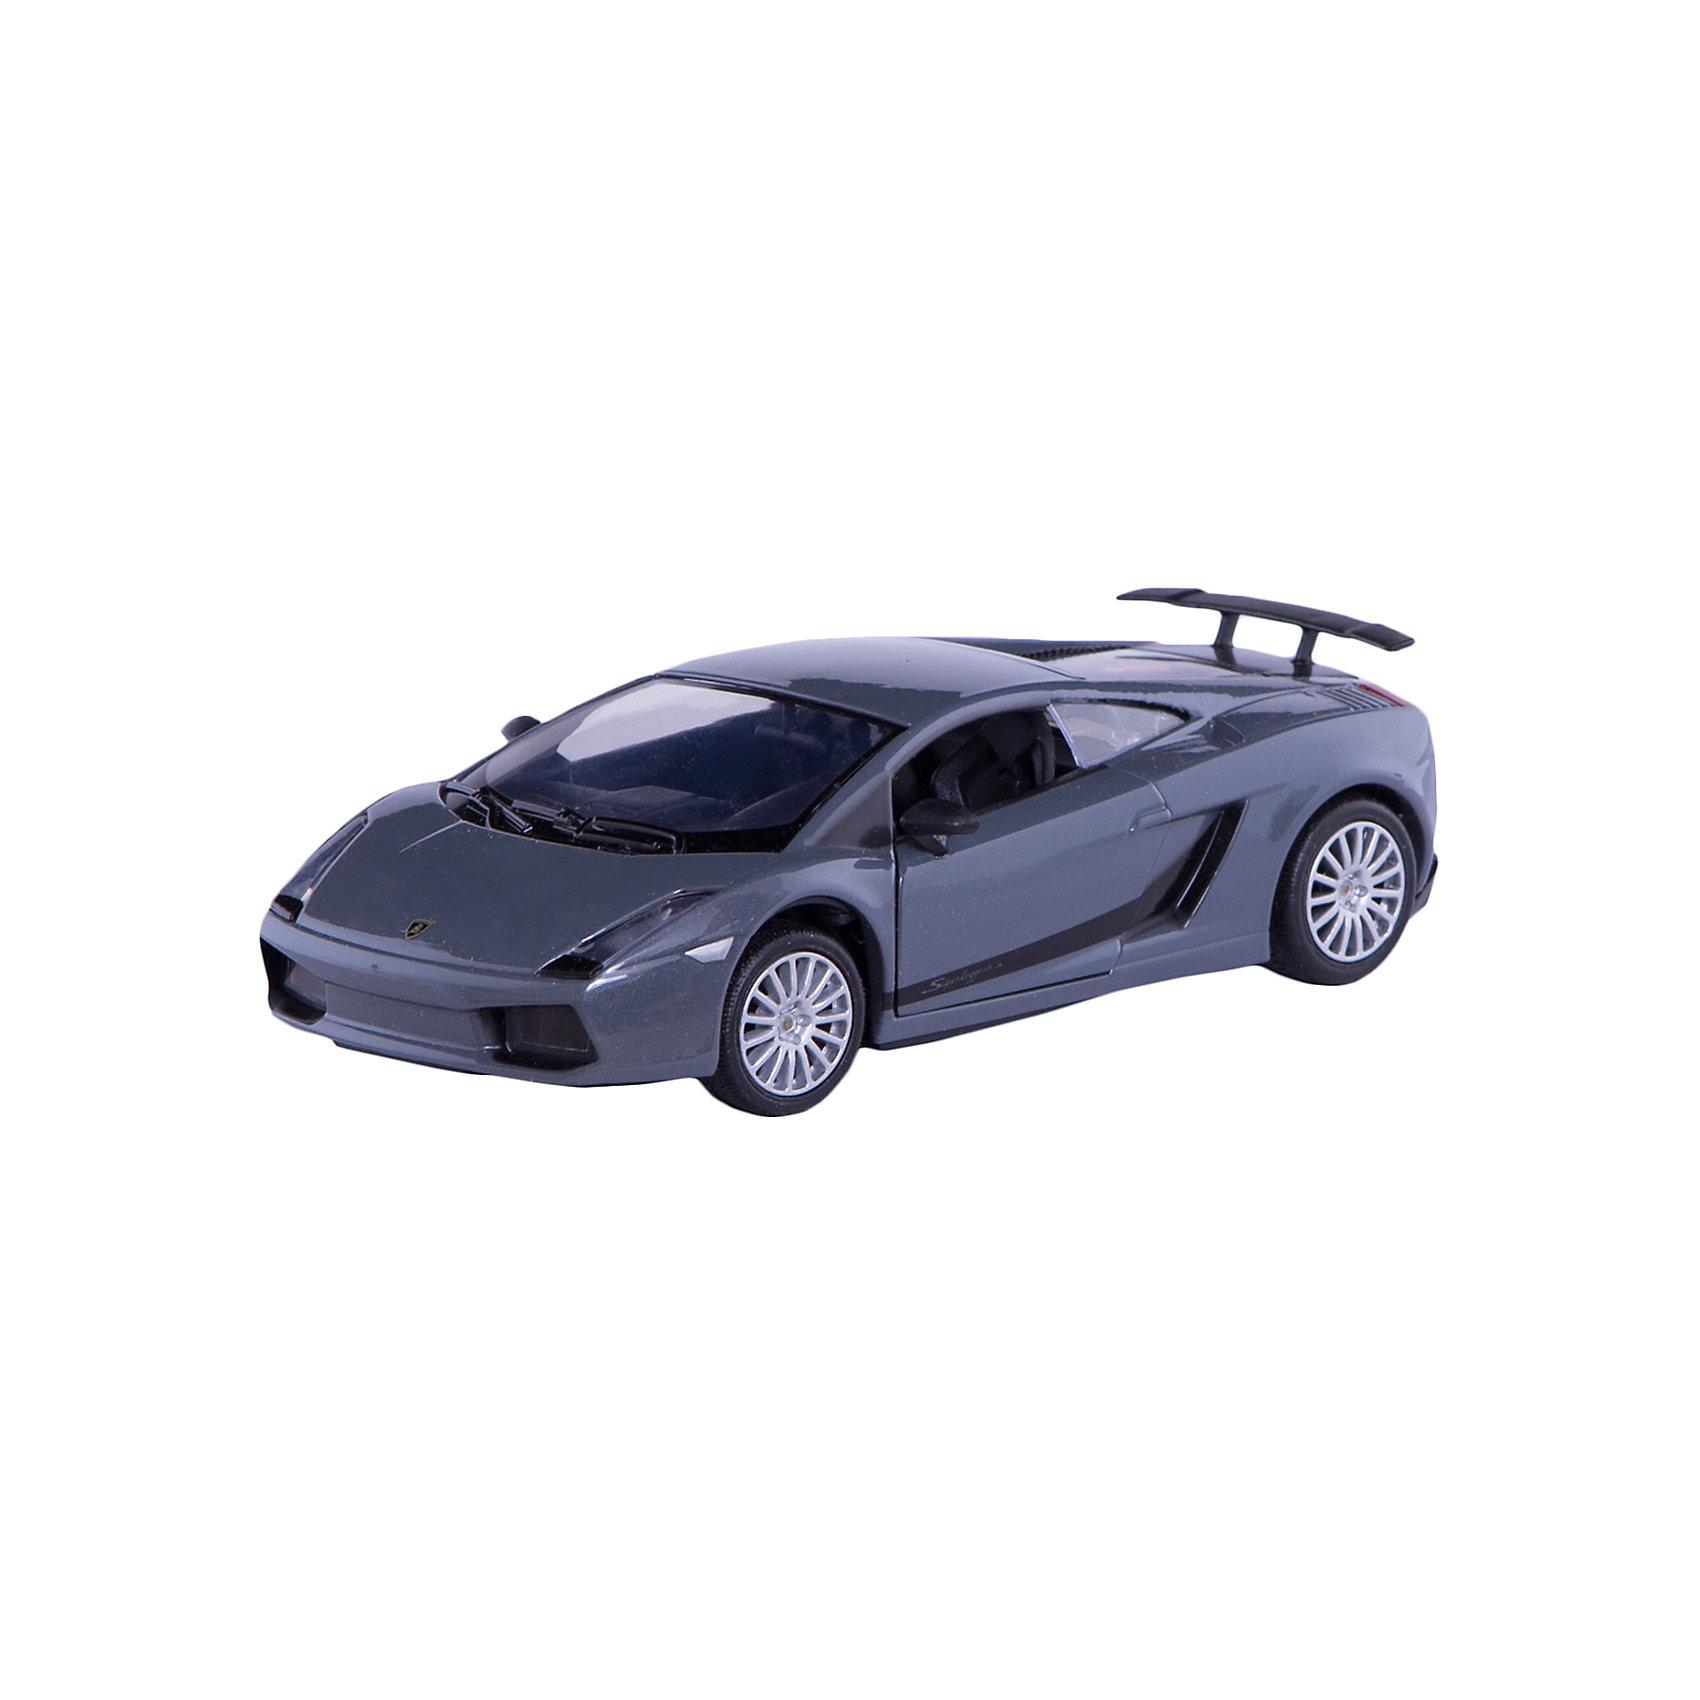 - Машина LAMBORGHINI GALLARDO SUPERLEGGERA, 1:24, в ассортименте машины motormax модель автомобиля lamborghini gallardo масштаб 1 60